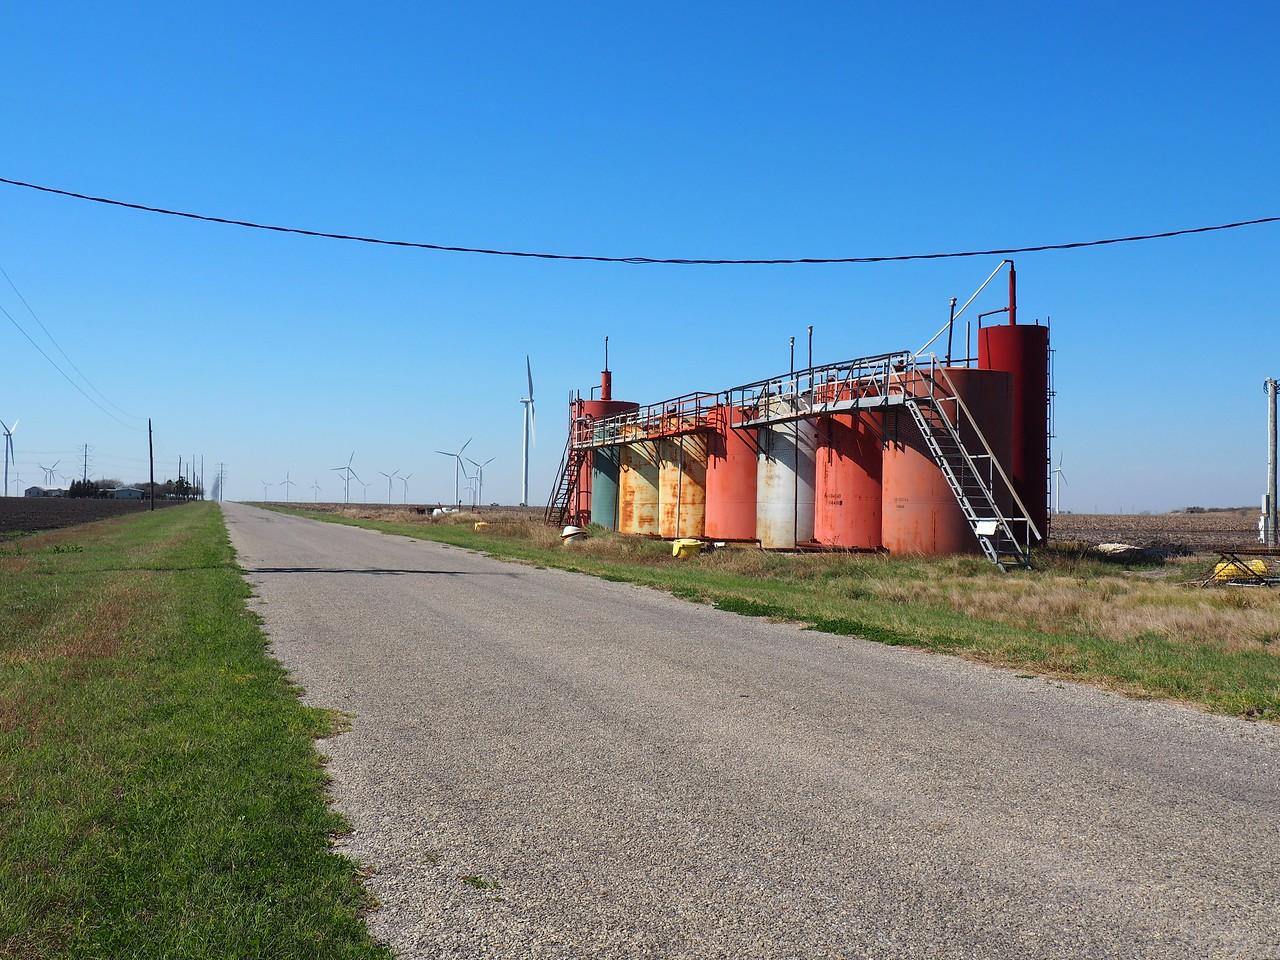 Storage tanks southwest of Taft